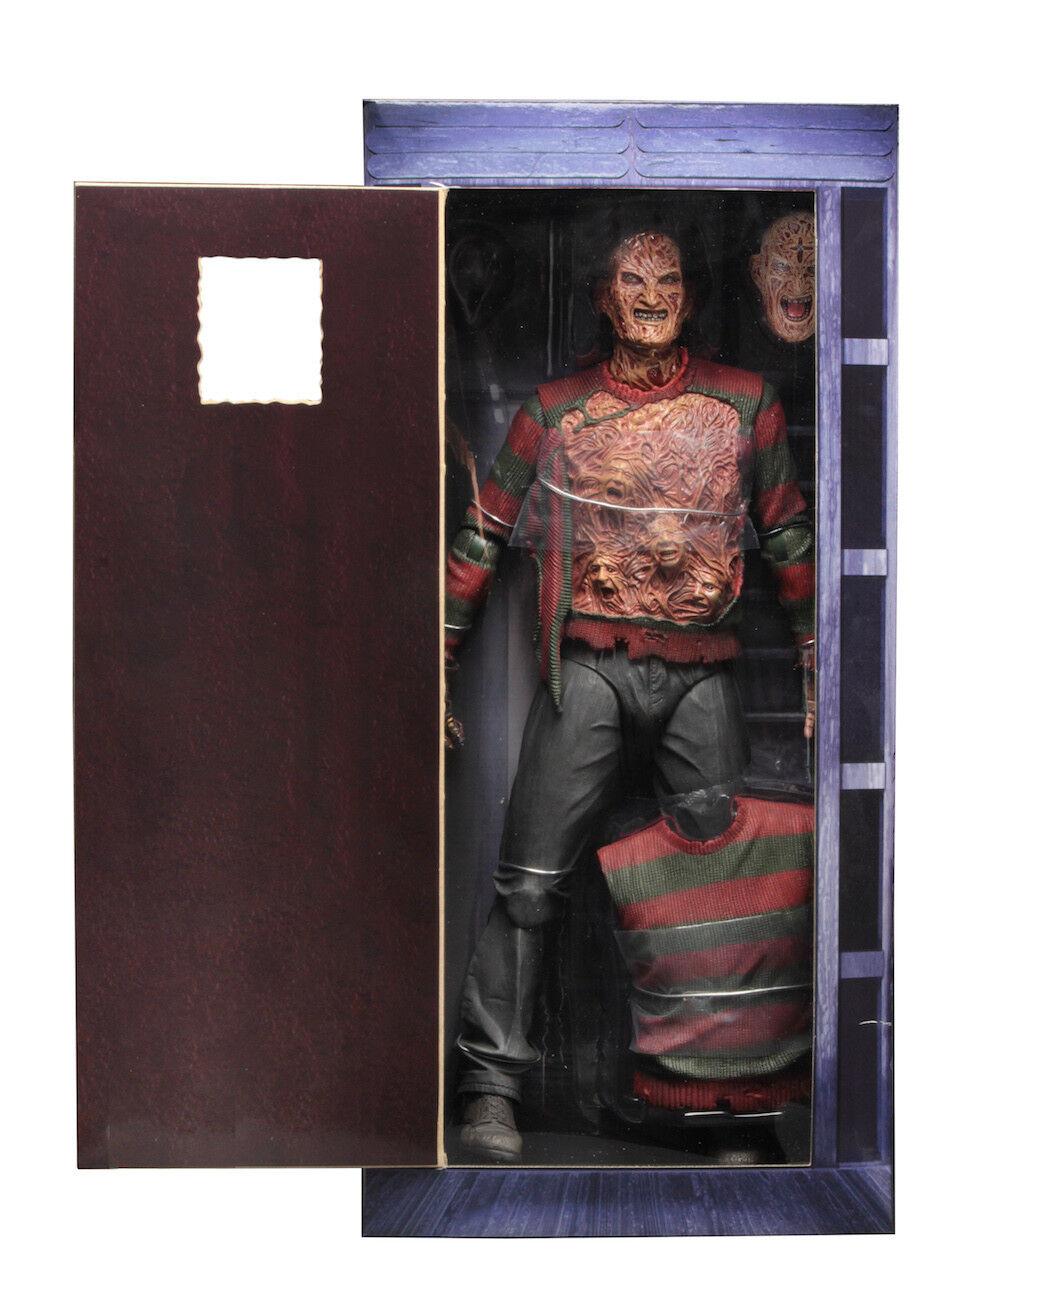 Pesadilla en Elm Street 3 - Frojody Krueger 1   4, hoja de movimiento, 35, Nueva.